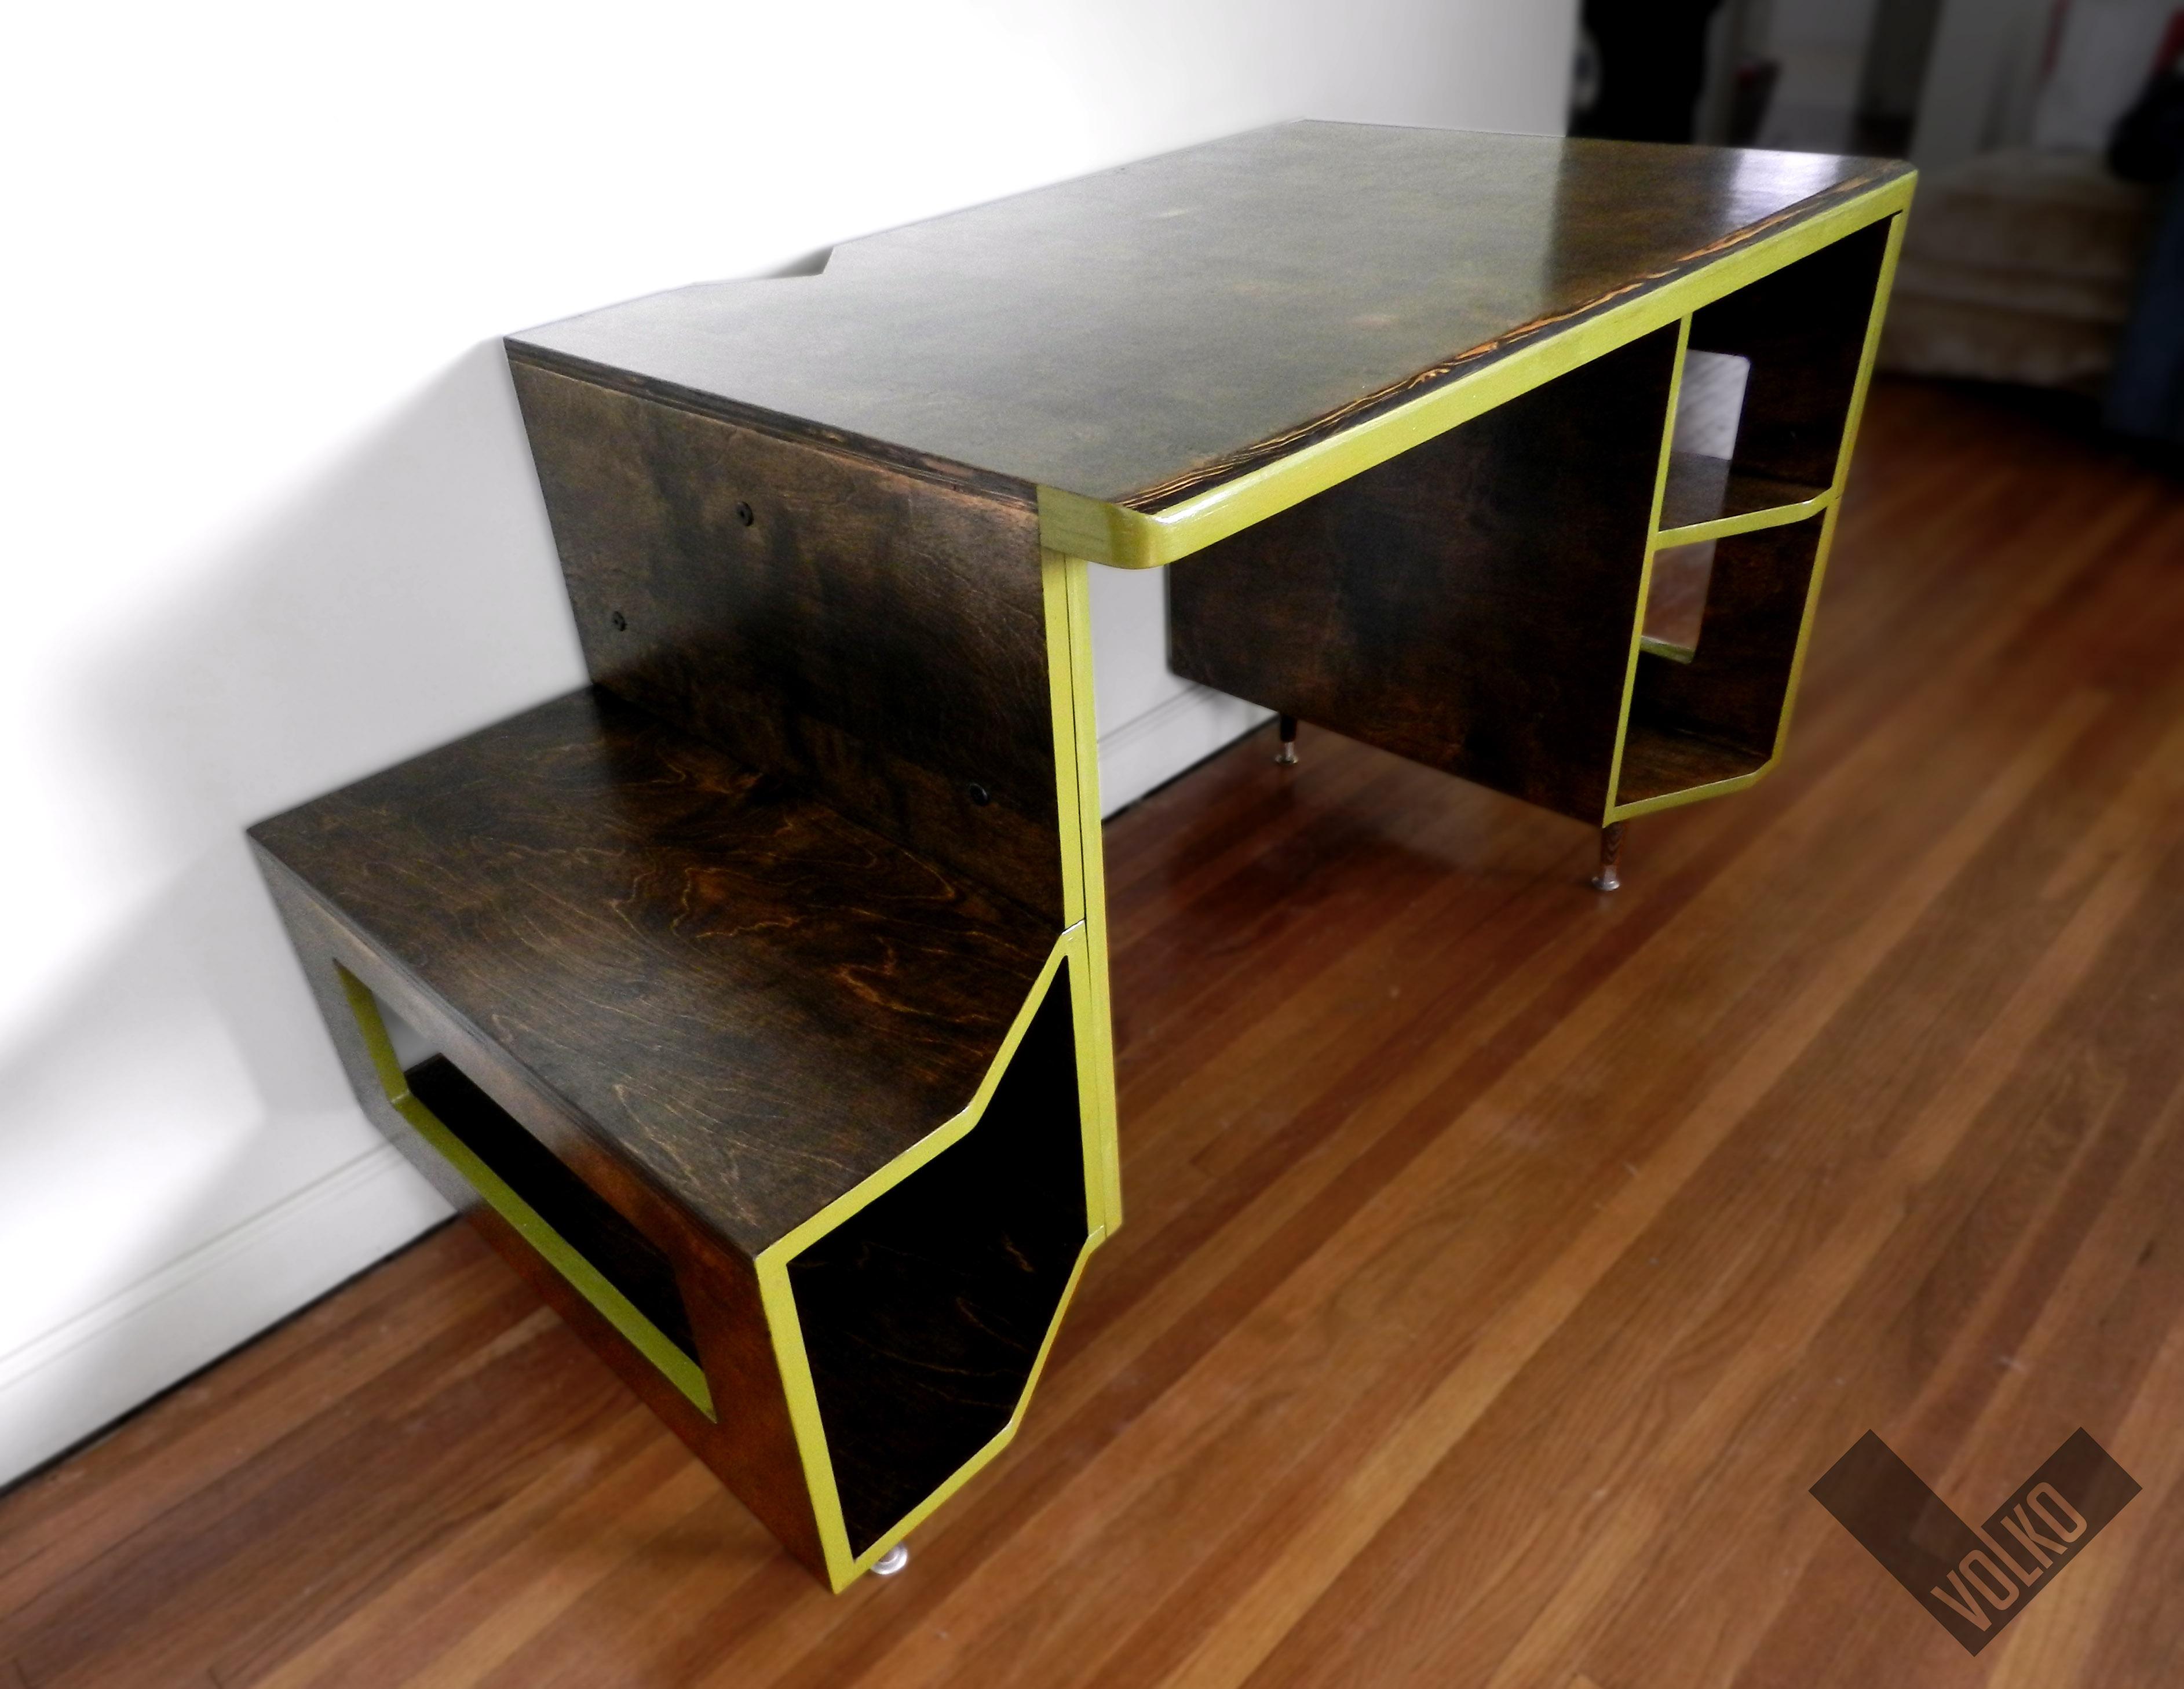 Paragon Gaming Desk By Tom Balko At